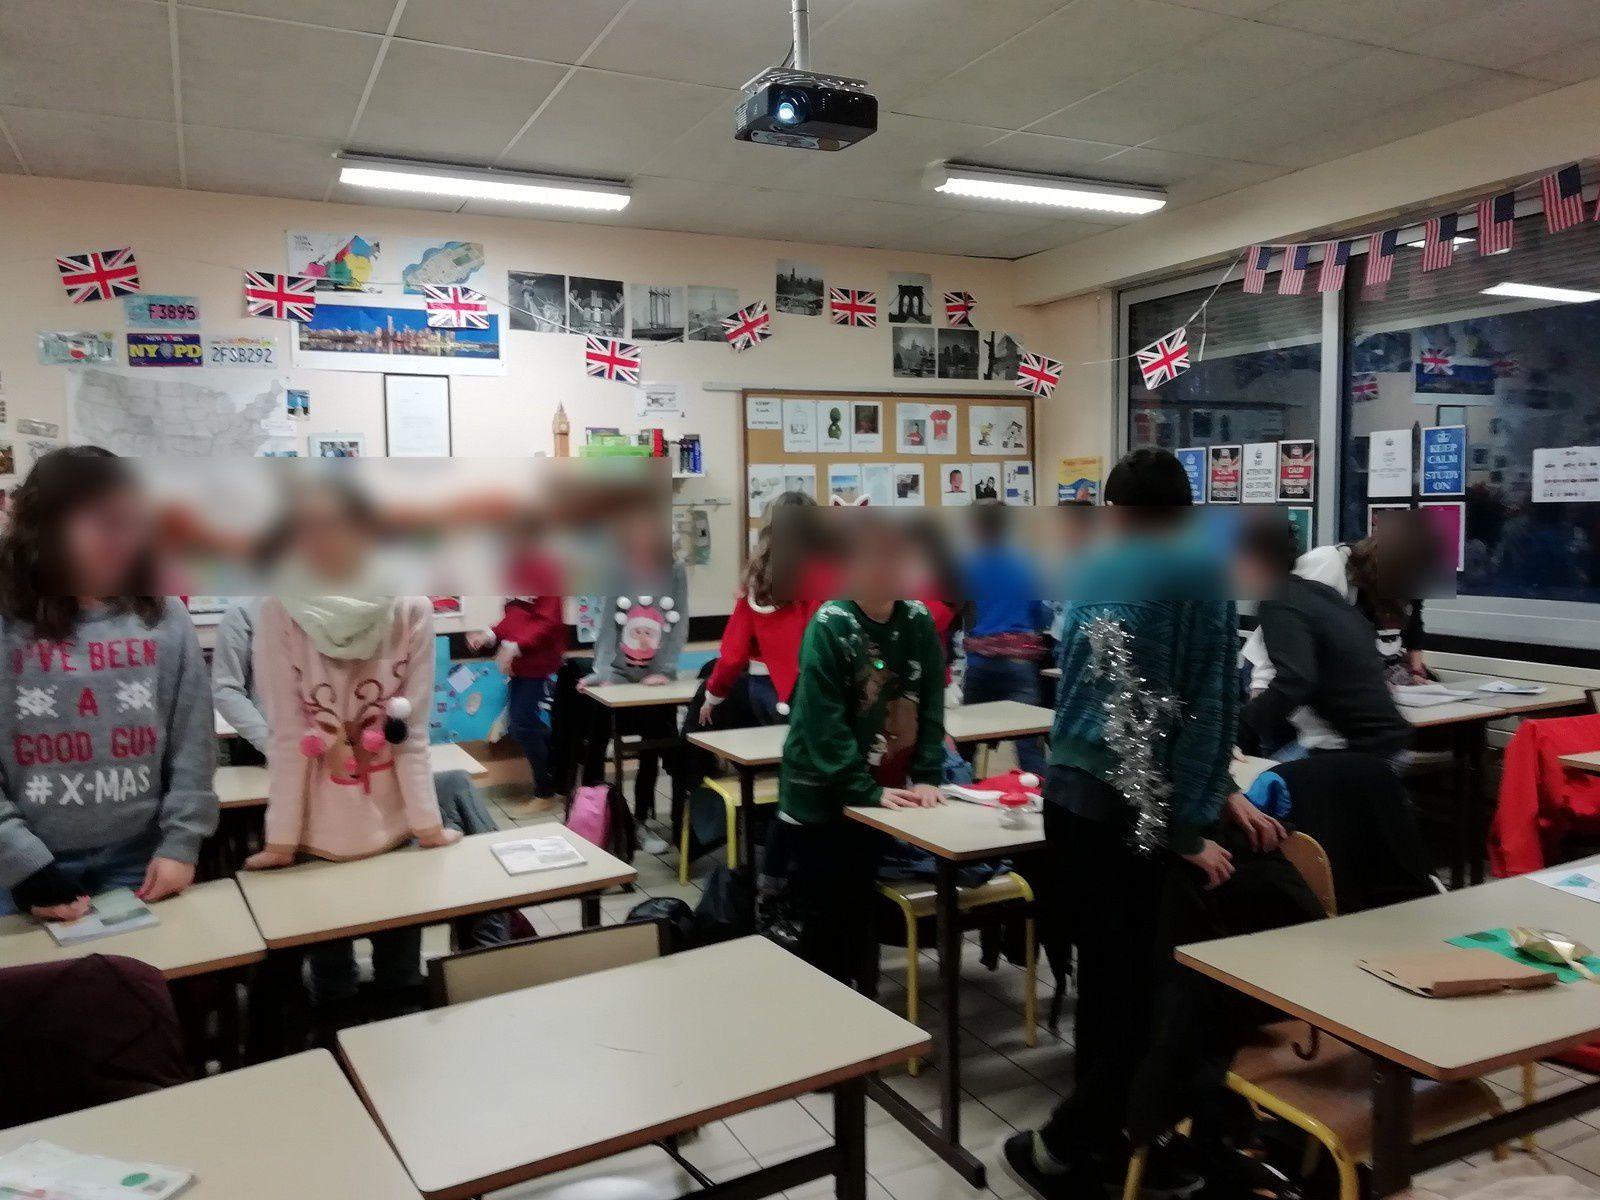 Christmas Pullover day in Jean Monnet! / secret Santa / Britain's got talent!